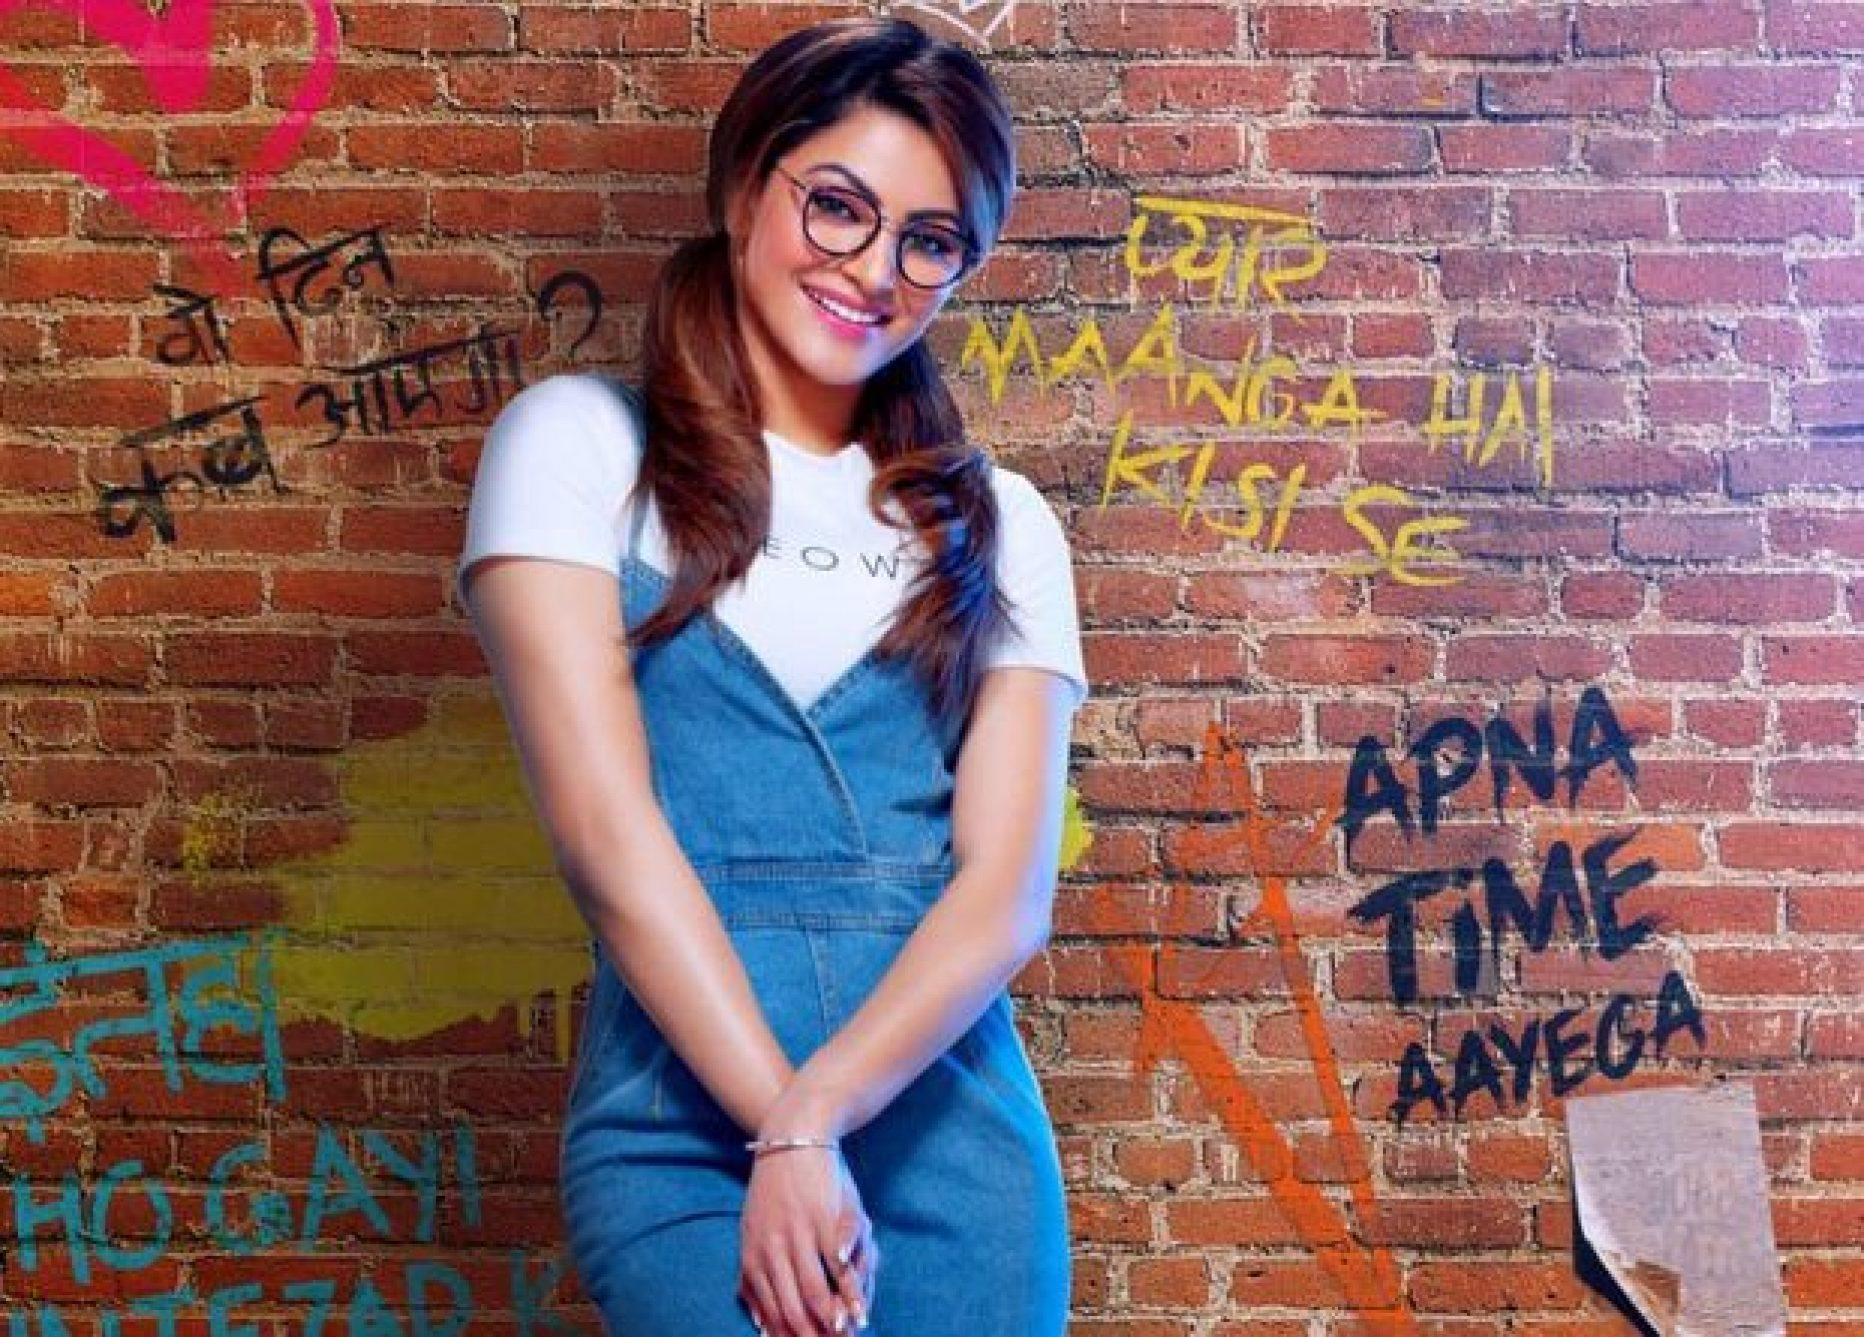 Urvashi Rautela Film 'Virgin Bhanupriya' Releasing on OTT Platform